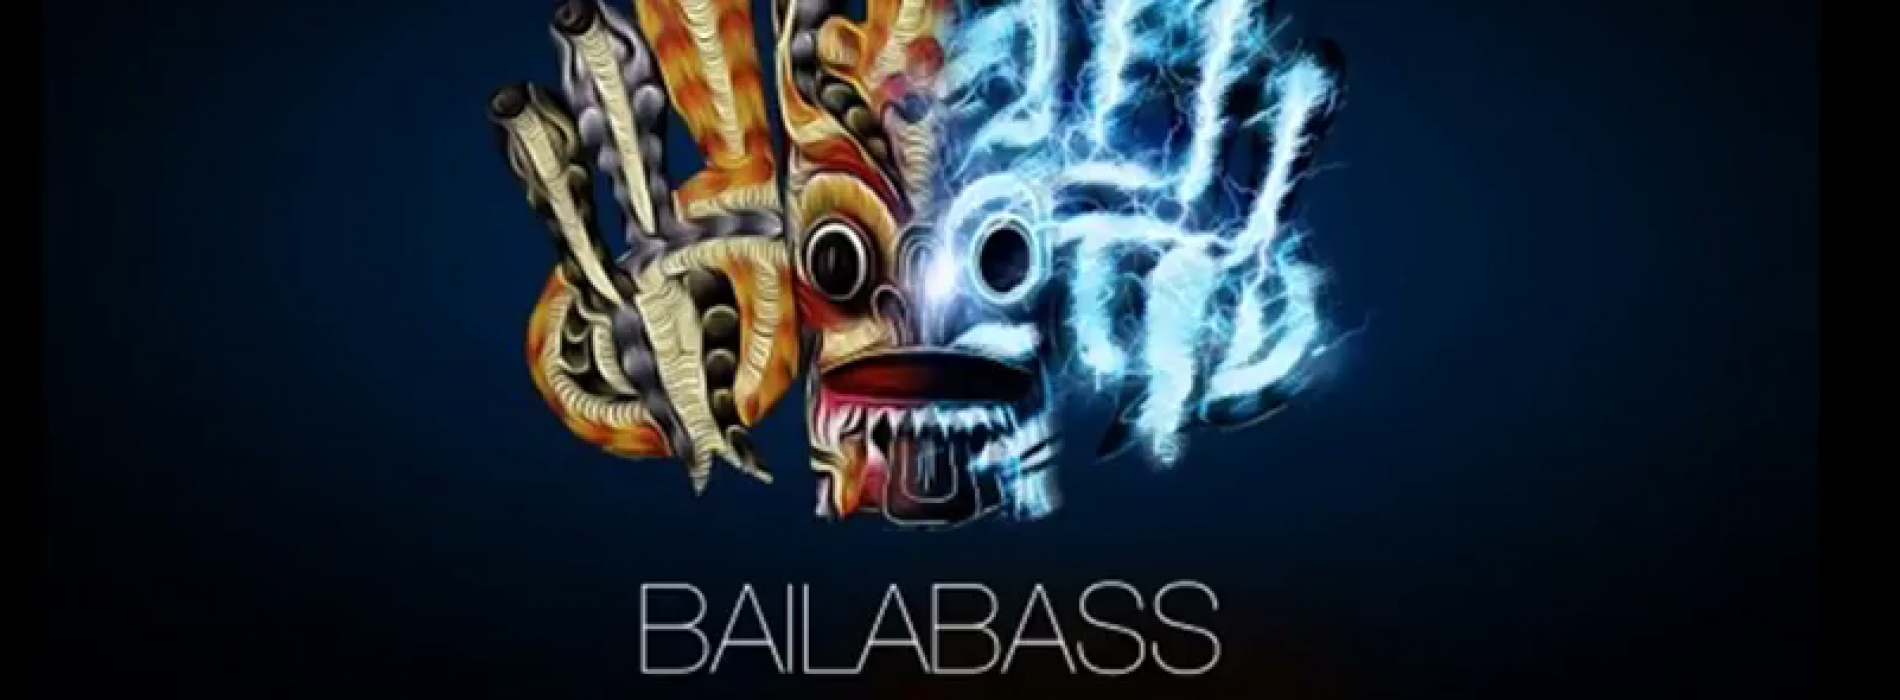 Bailatronic: How To Dance